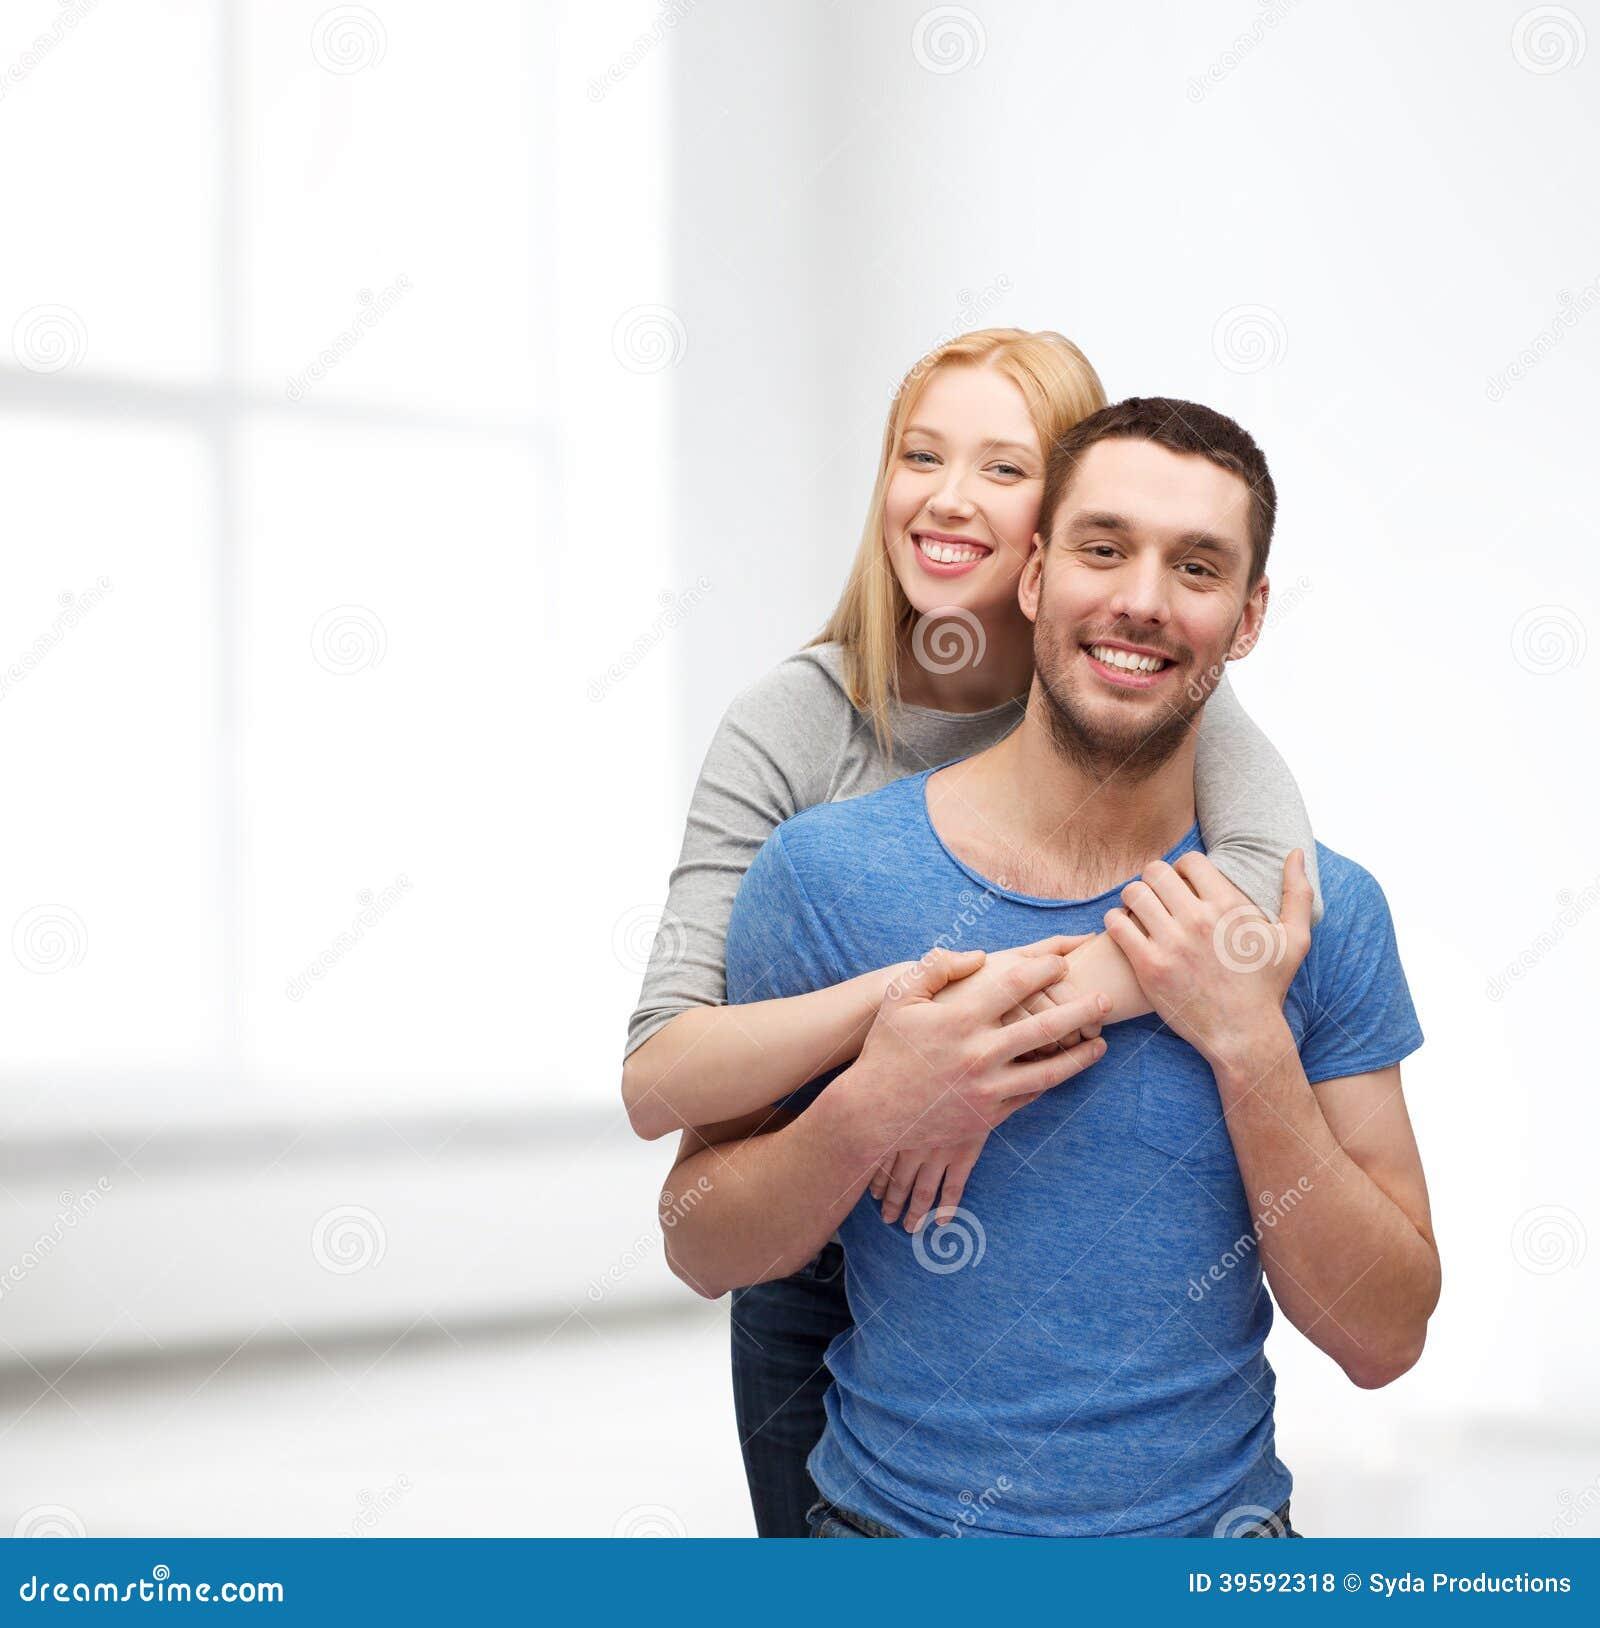 Smiling Couple Hugging Stock Photo. Image Of Hugging